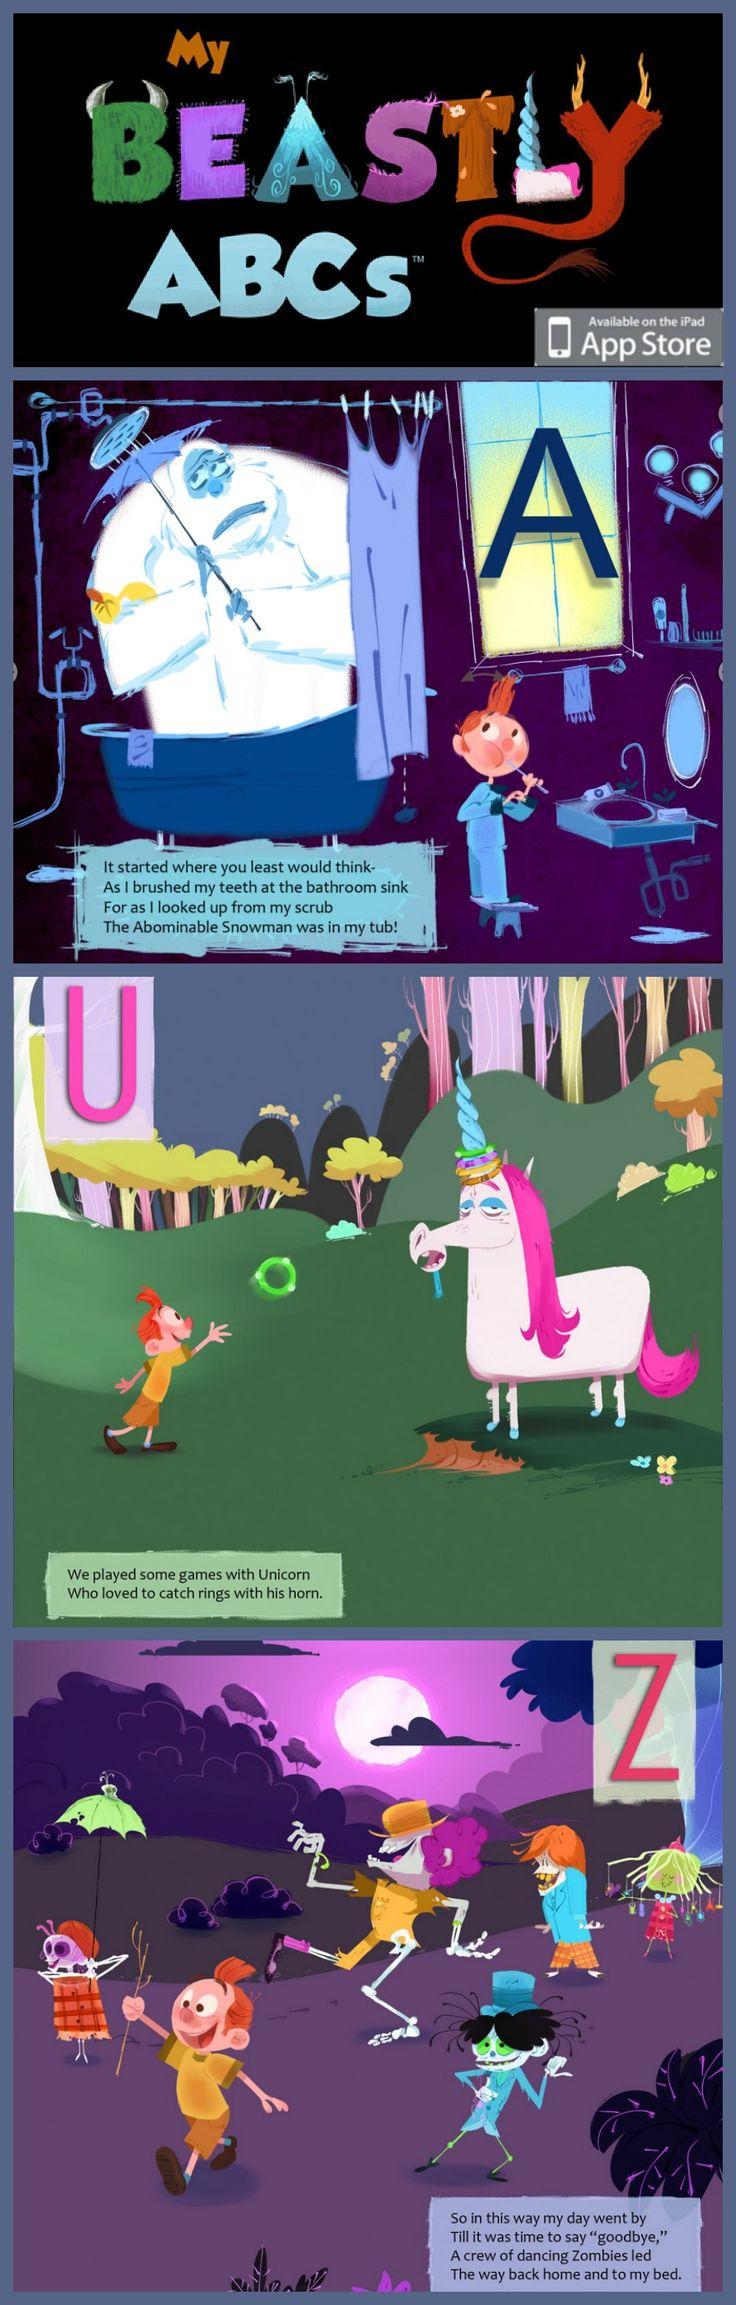 Character Design Ipad App : We love this imaginative interactive alphabet ipad storybook